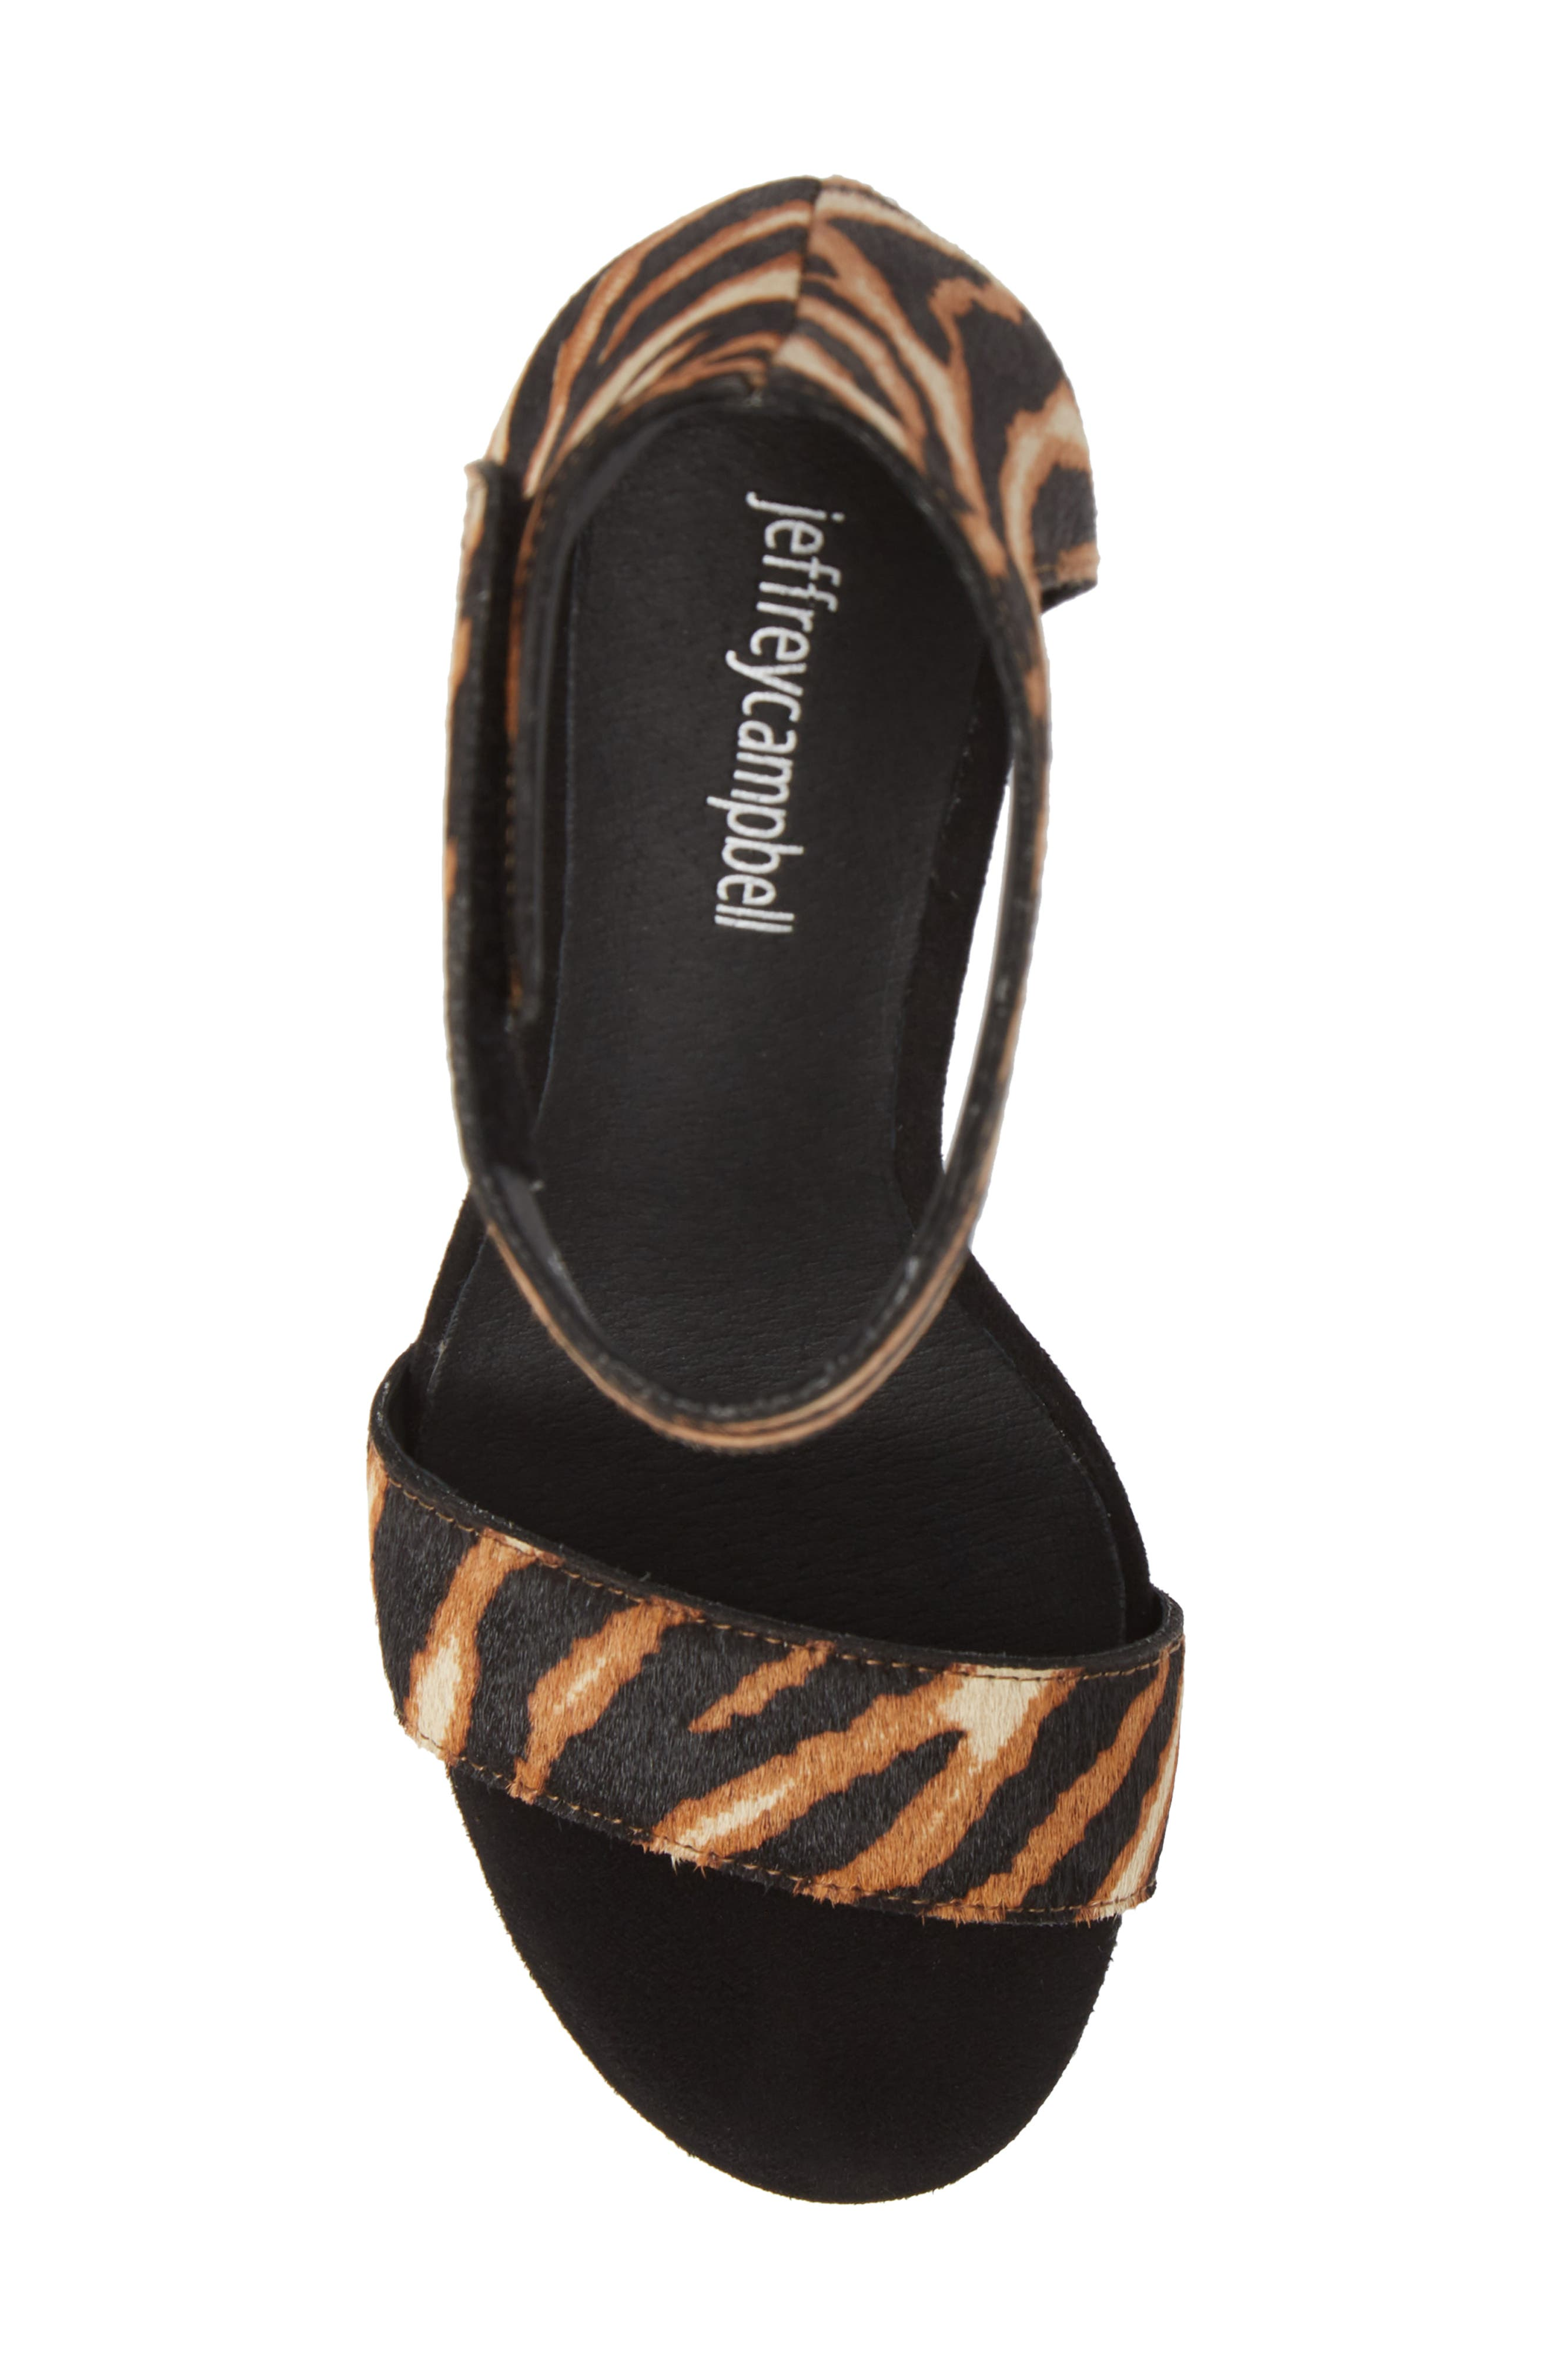 JEFFREY CAMPBELL, Lindsay Genuine Calf Hair Ankle Strap Sandal, Alternate thumbnail 5, color, BEIGE ZEBRA PRINT LEATHER